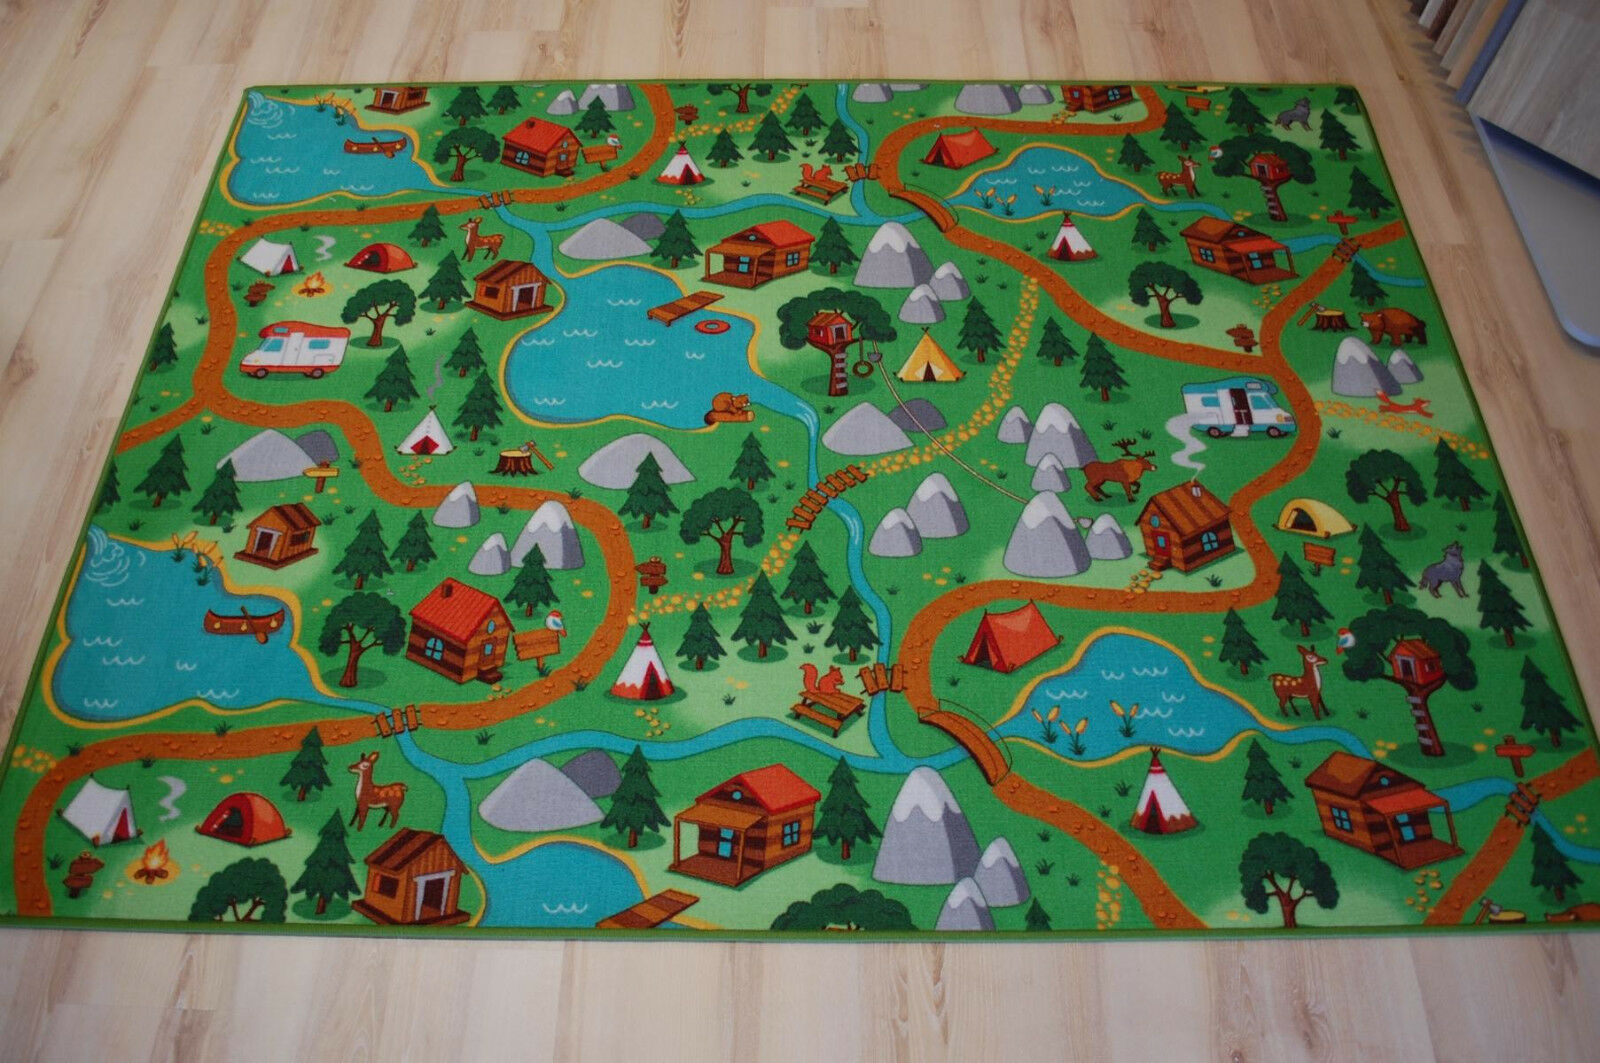 Enfants Tapis Tapis de jeu Camping velours vert 200x700 cm forêt